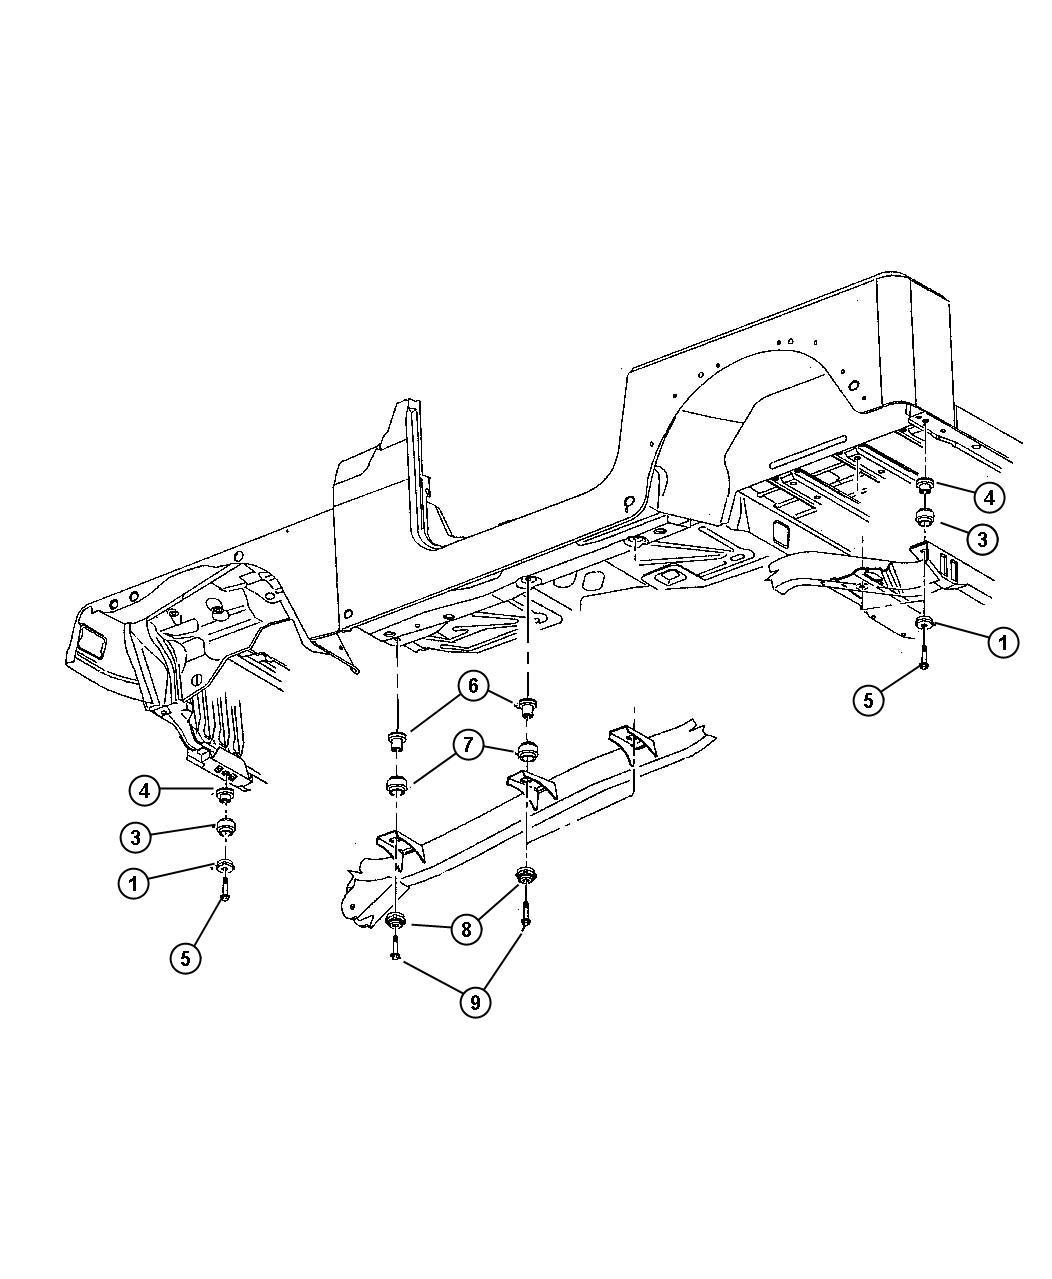 1999 Jeep Wrangler Insulator  Body Hold Down  Upper Body